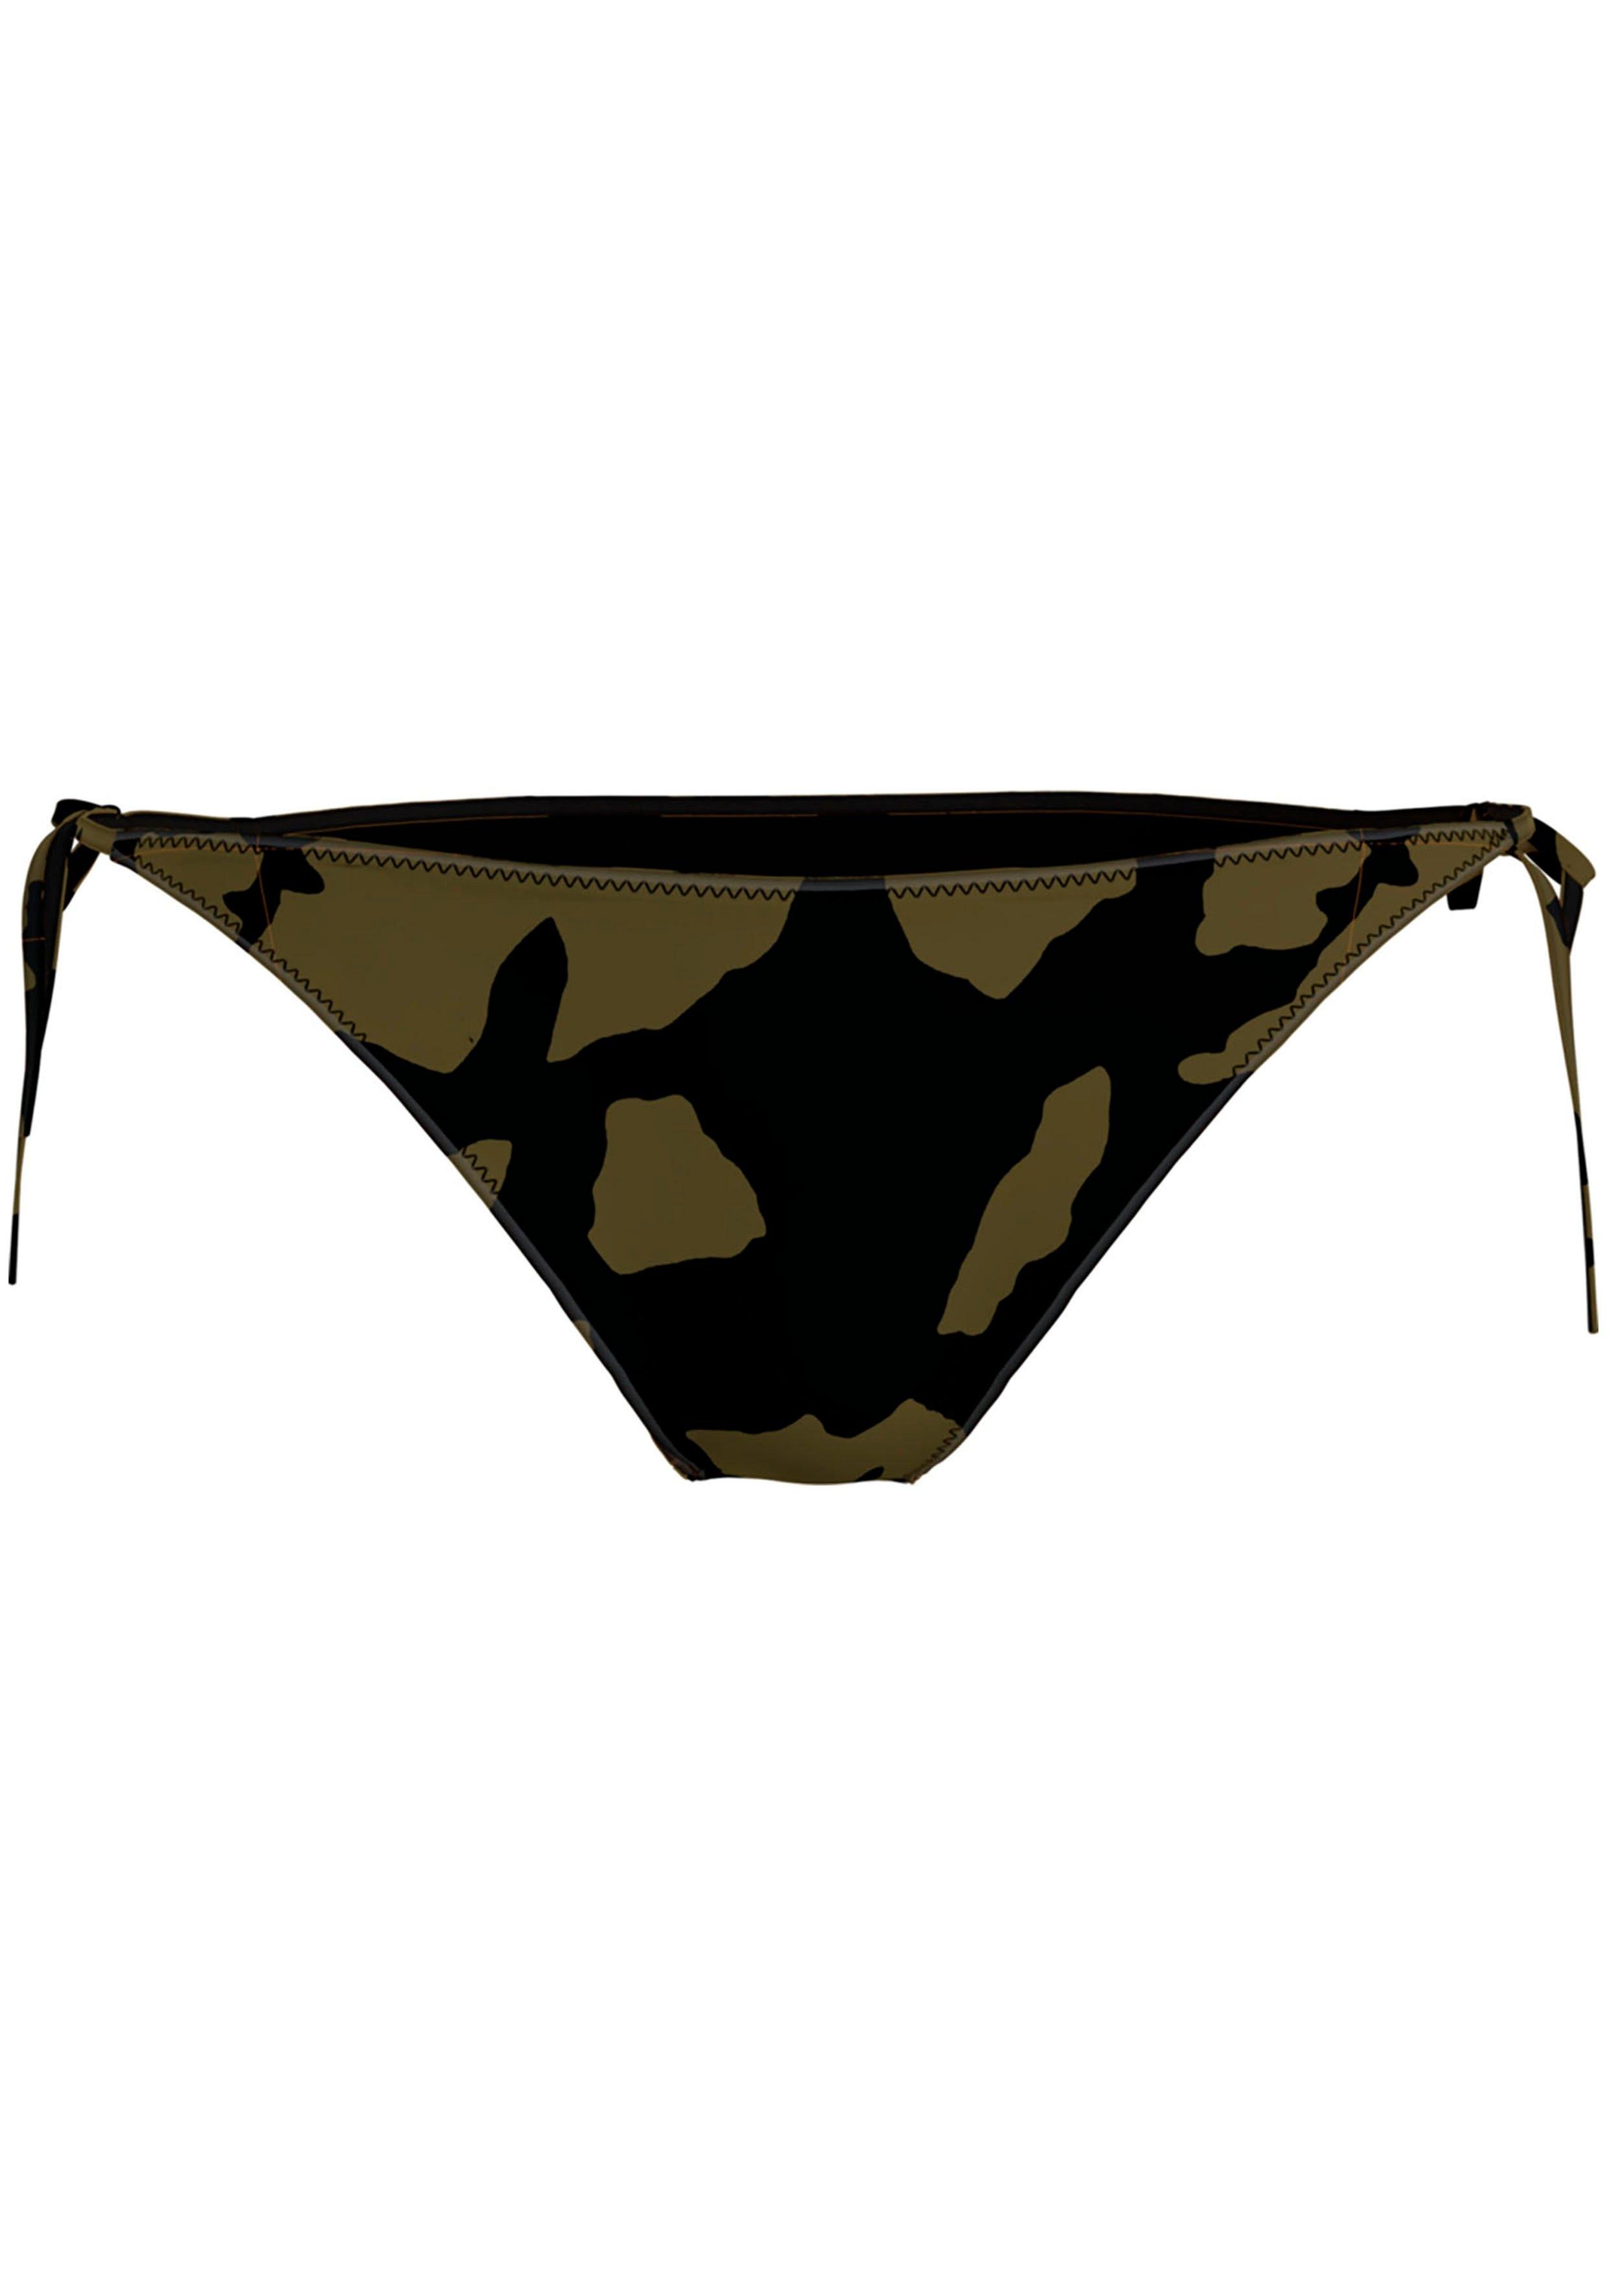 Calvin Klein bikinibroekje opzij te strikken - gratis ruilen op otto.nl